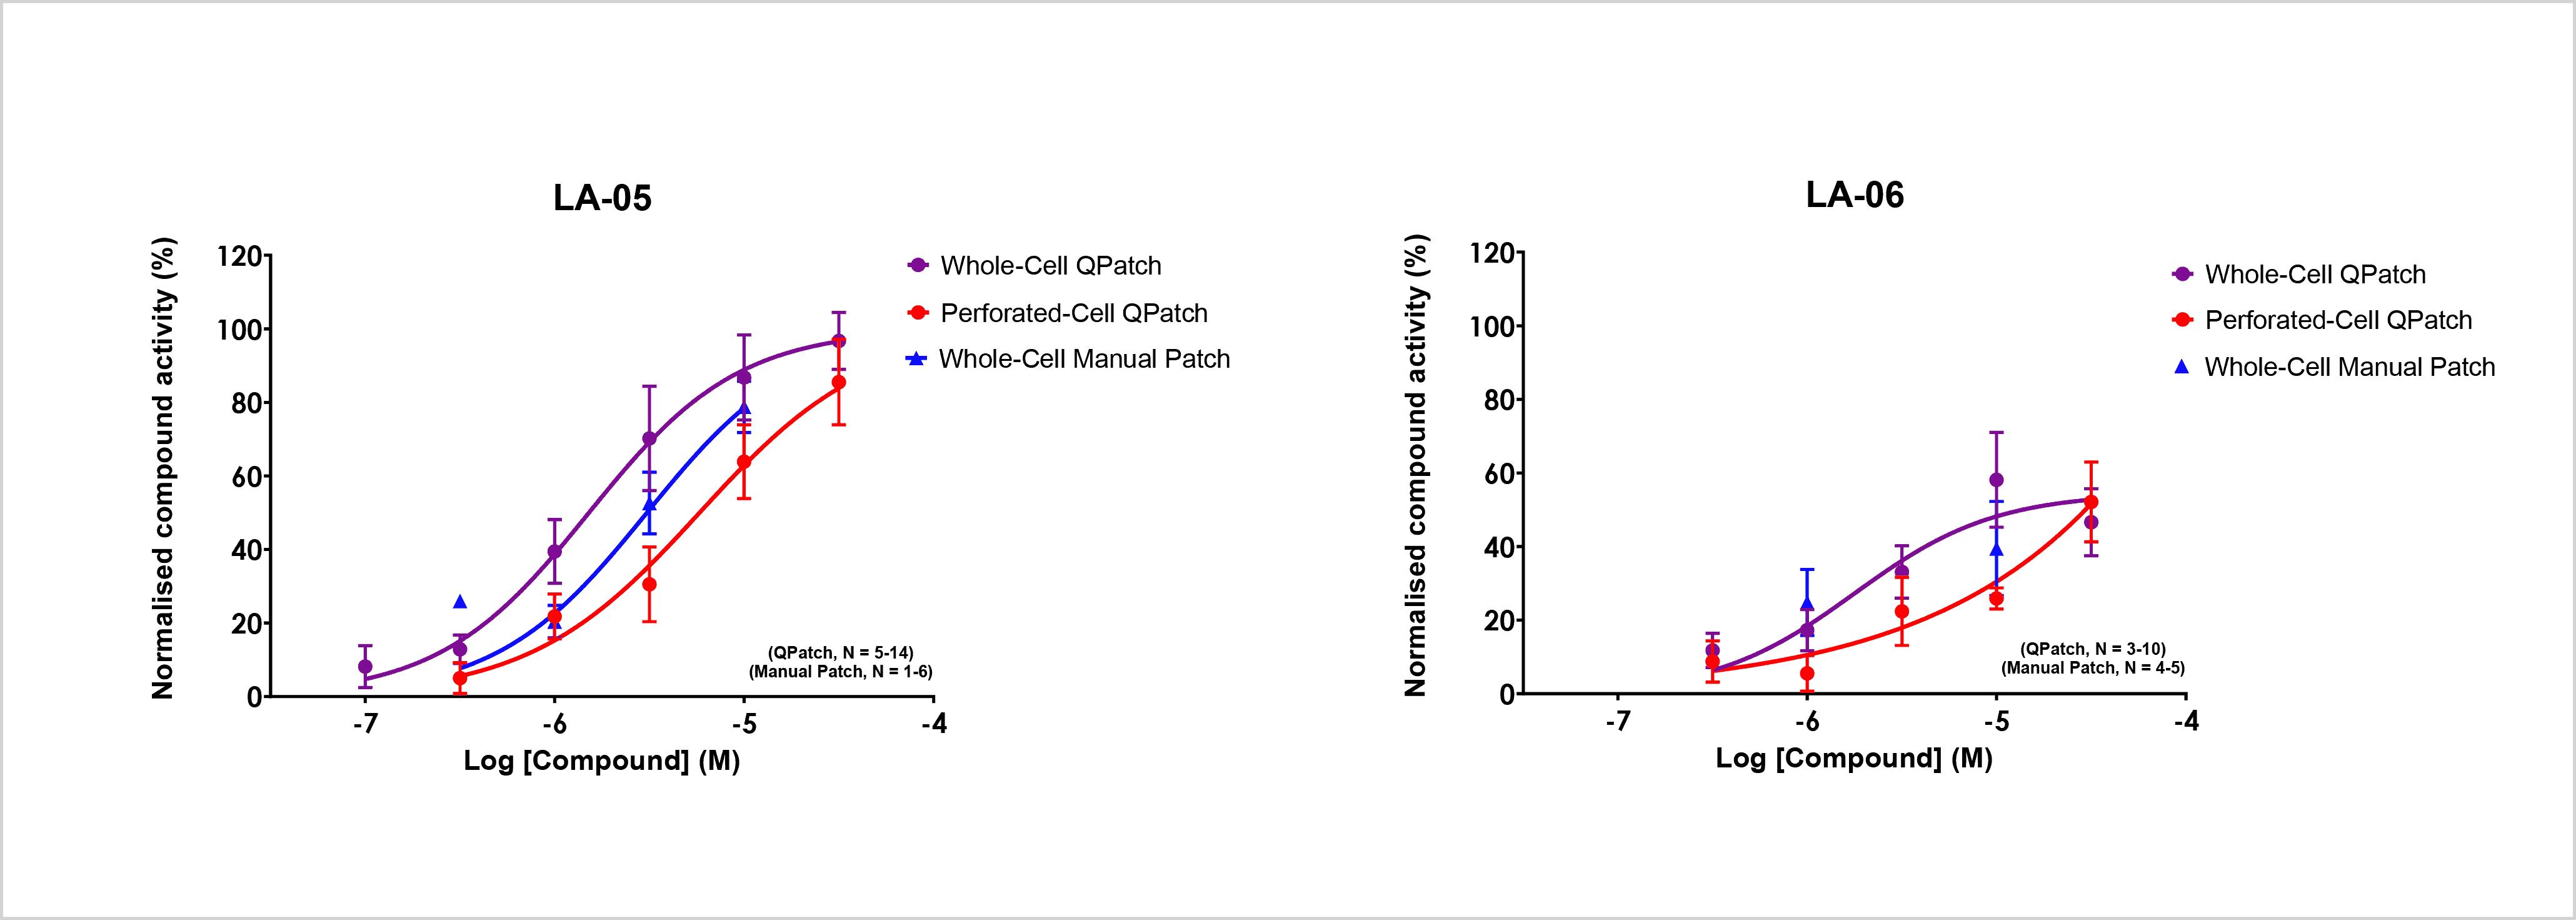 Dose response curves